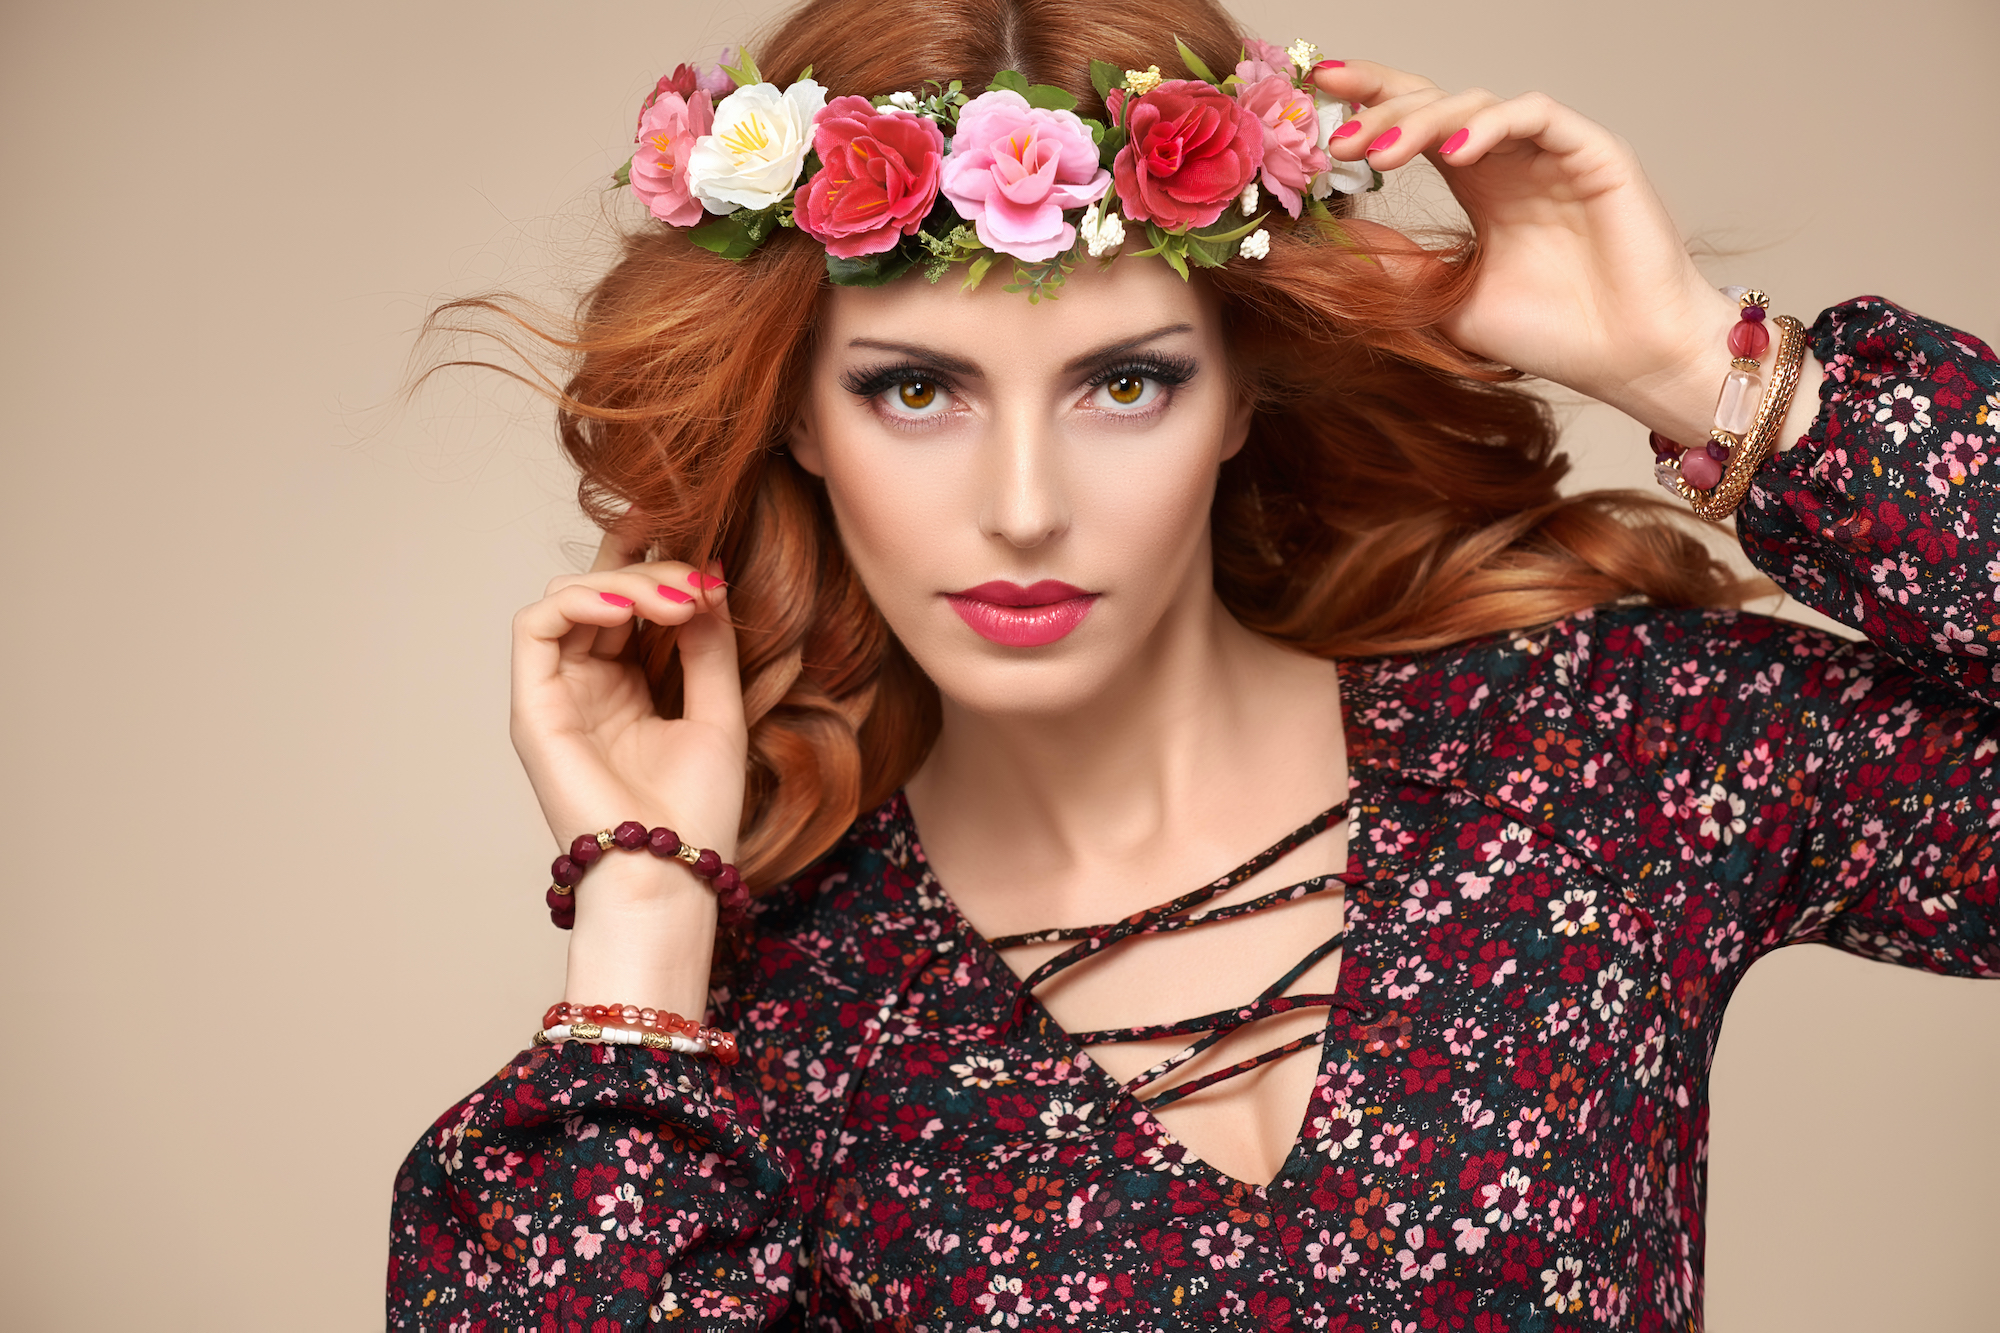 Autumn Fall Fashion. Redhead Woman Portrait.Makeup